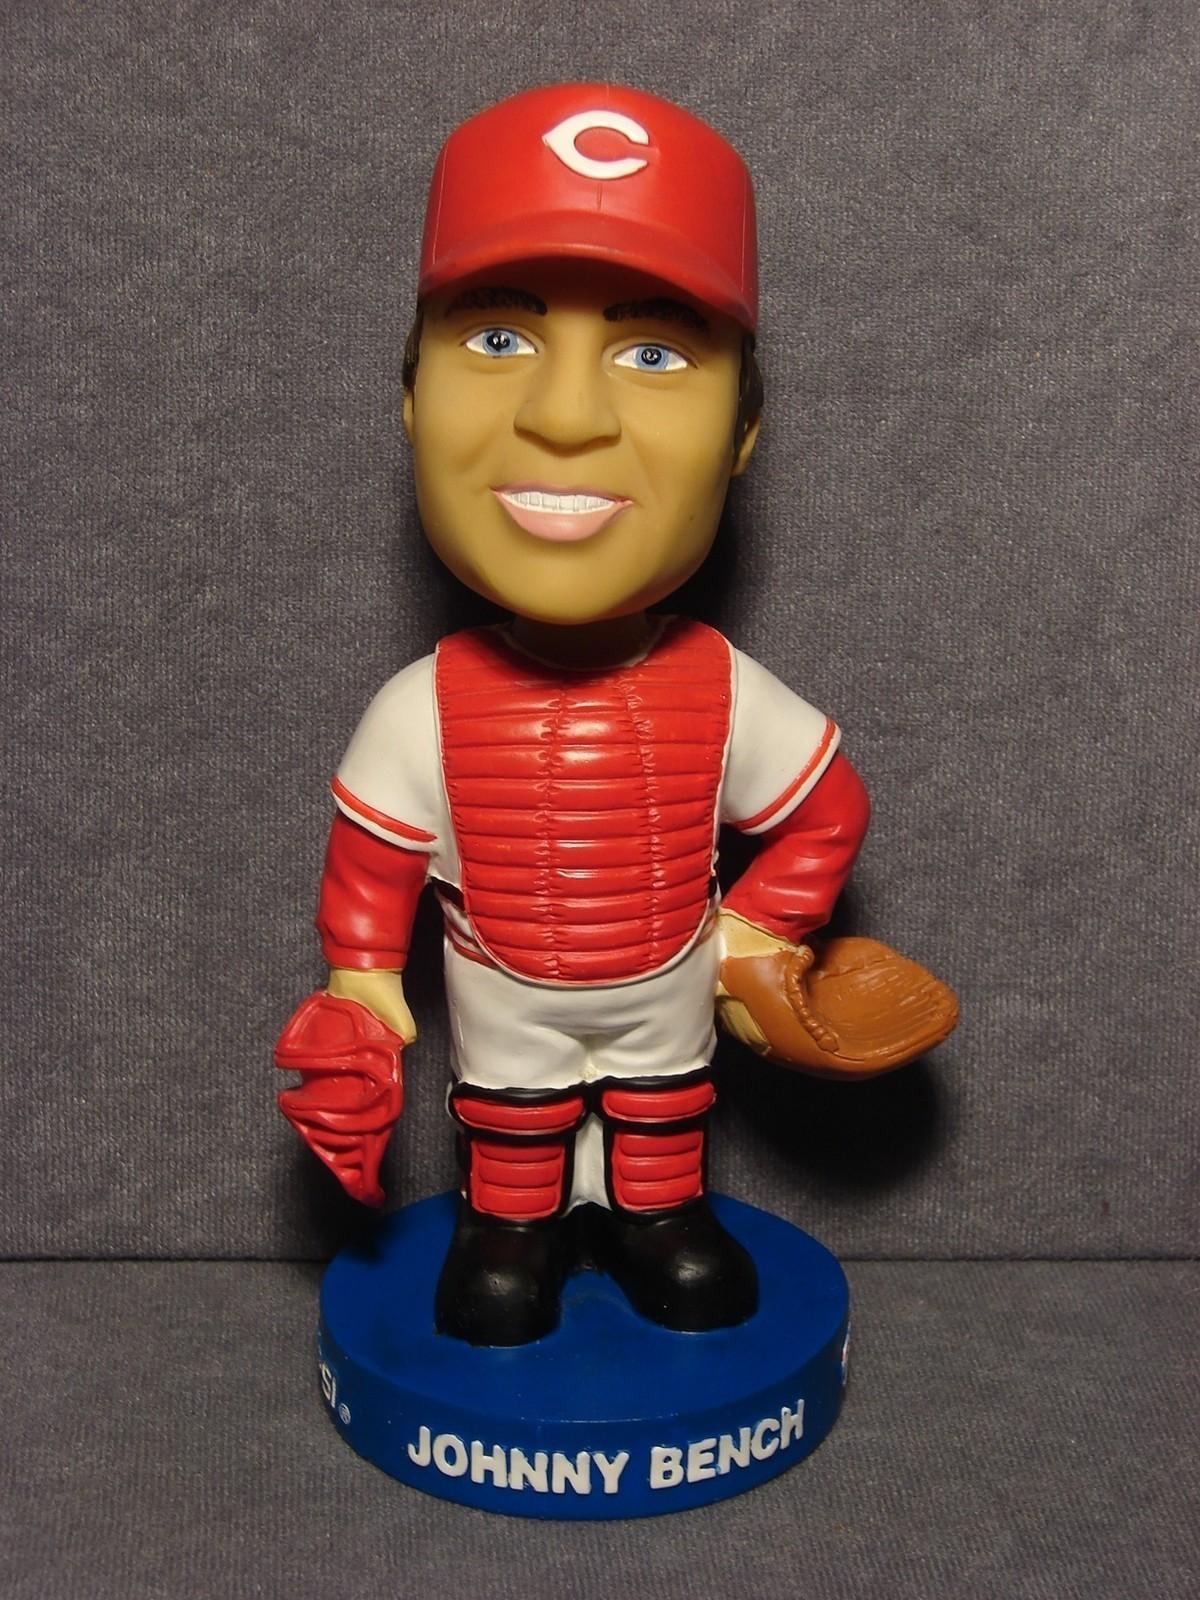 Cincinnati Reds Baseball Card Collector Bobblin Bench